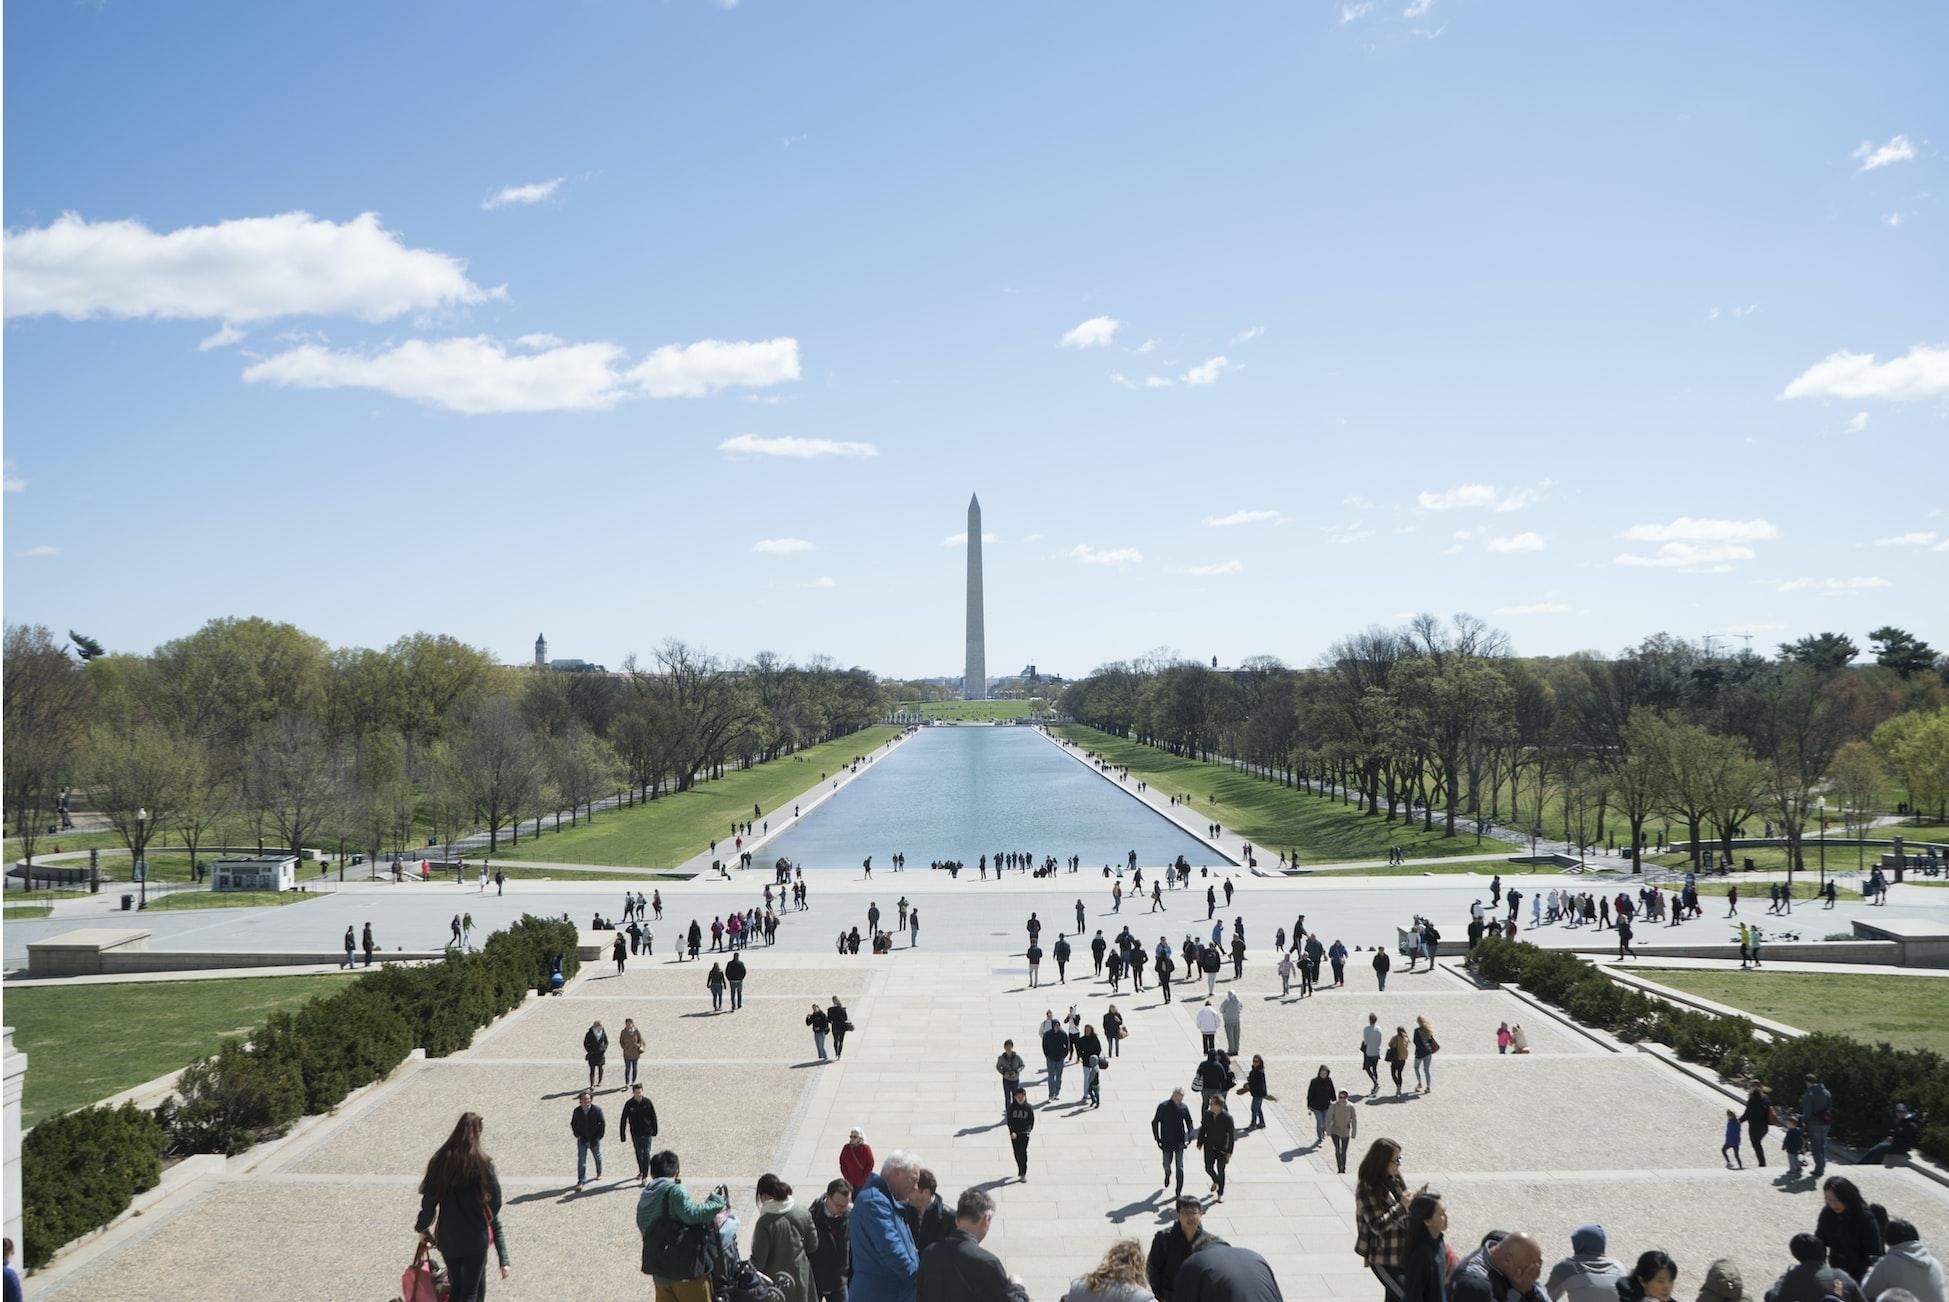 WASHINGTON, D.C NEWS RUNDOWN: WHAT YOU NEED TO HEAR